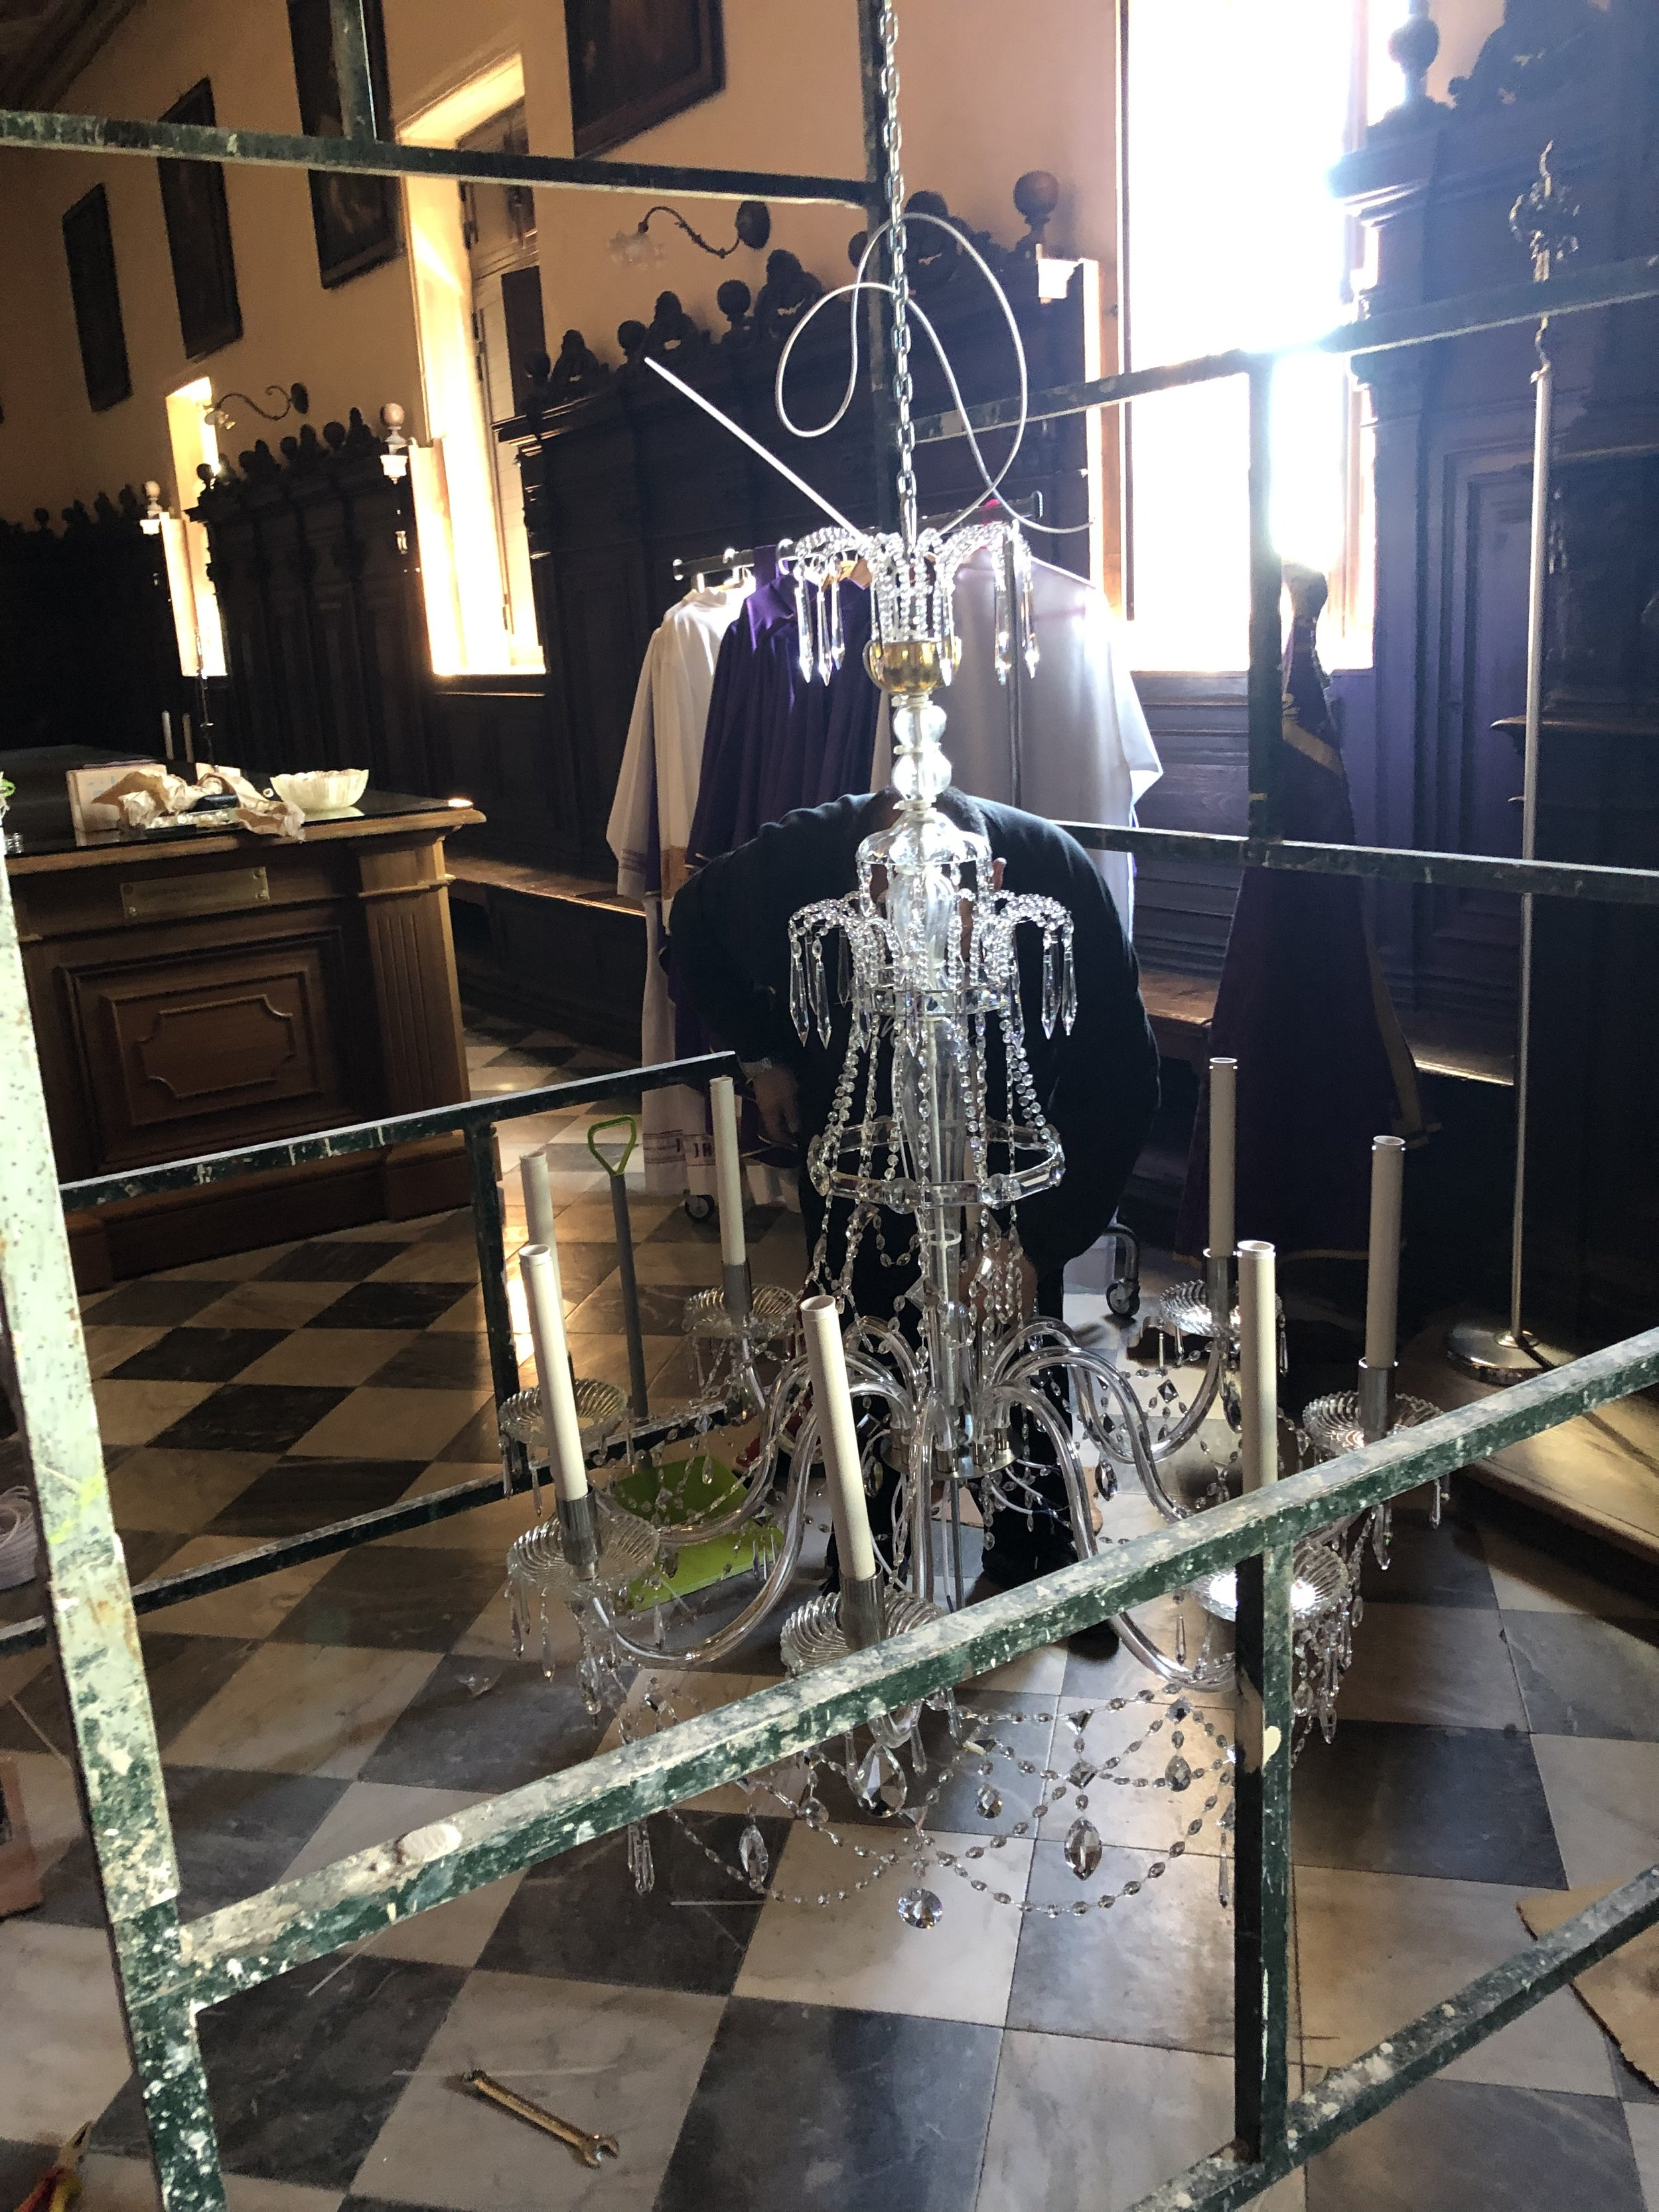 Installing the restored chandelier